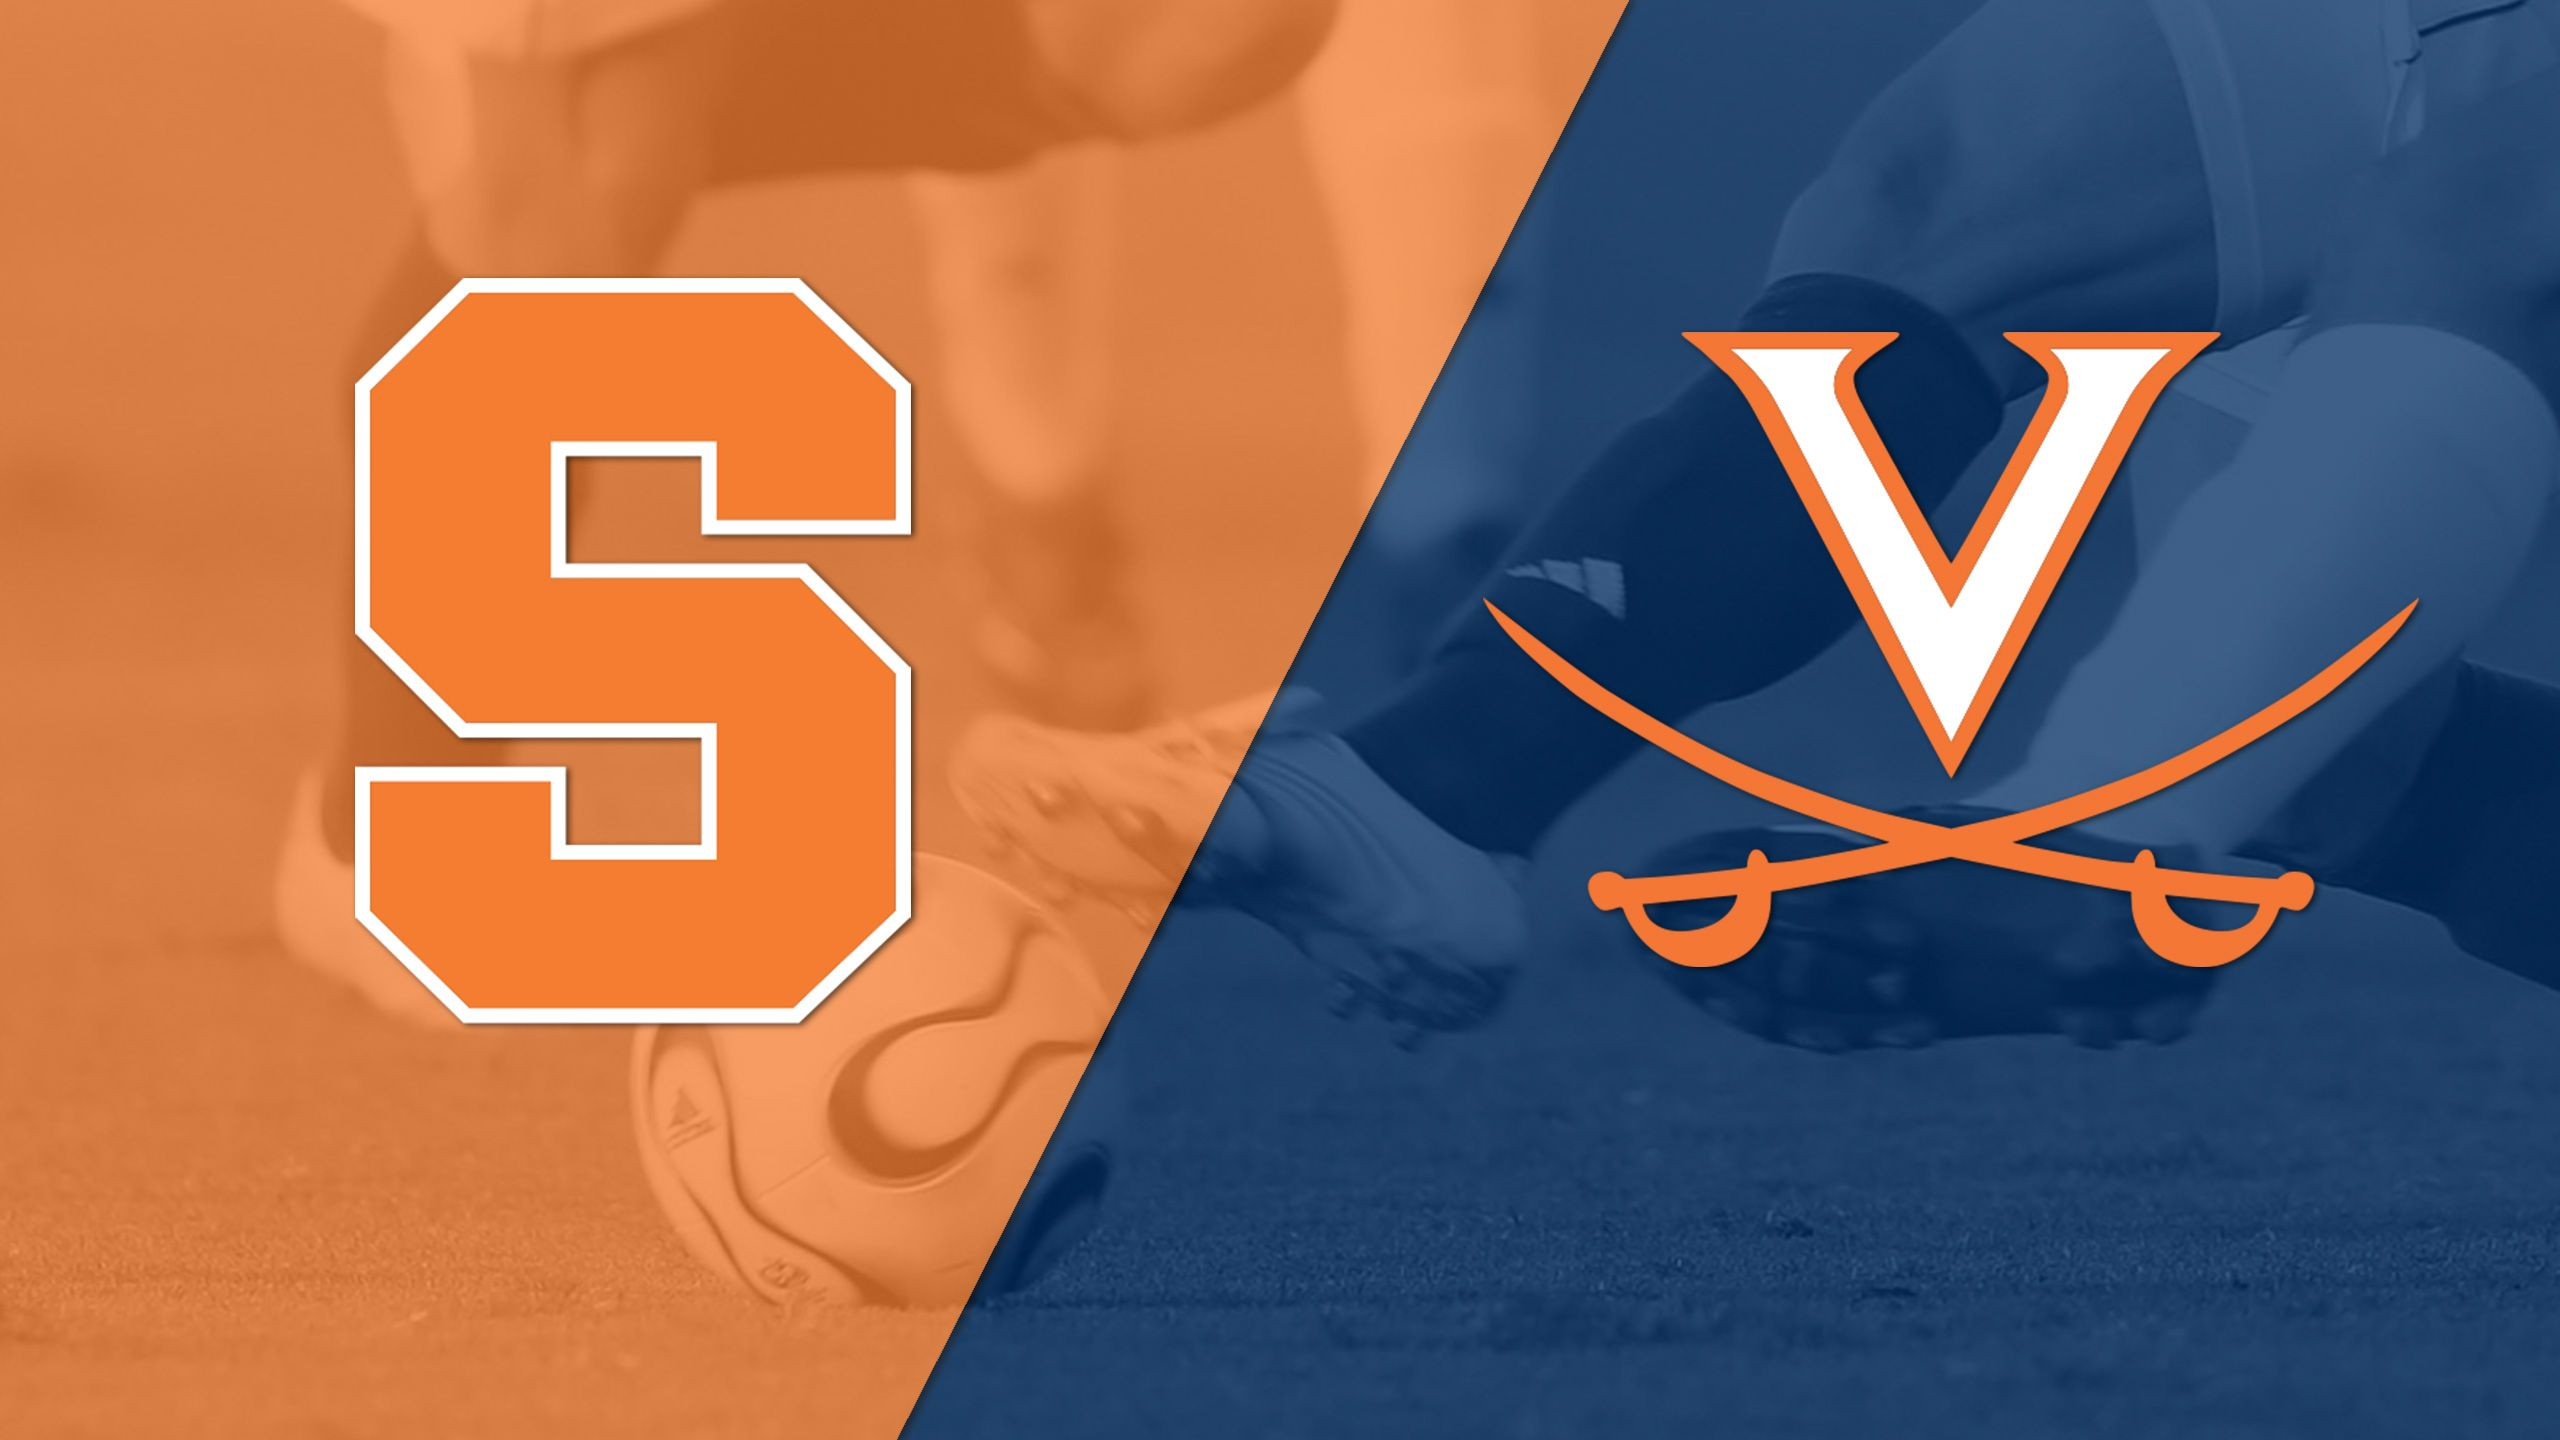 #7 Syracuse vs. #11 Virginia (M Soccer)